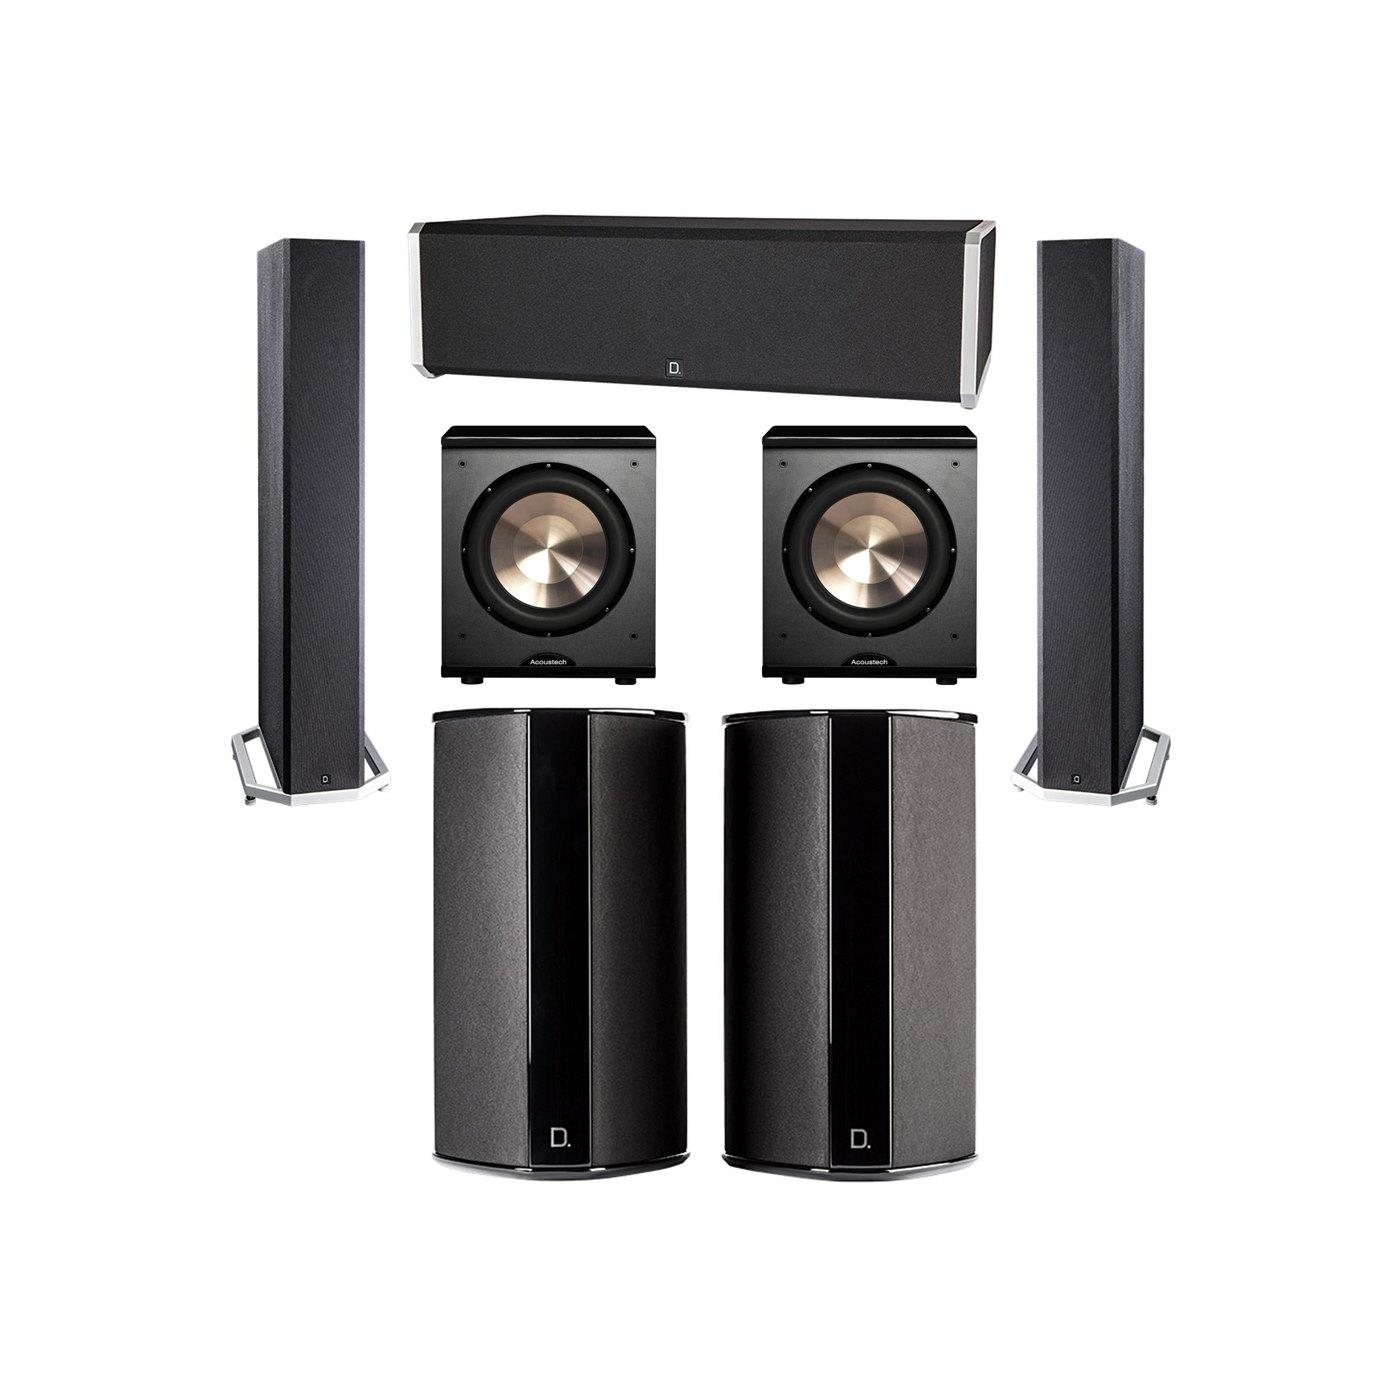 Definitive Technology 5.2 System with 2 BP9040 Tower Speakers, 1 CS9040 Center Channel Speaker, 2 SR9080 Surround Speaker, 2 BIC PL-200 Subwoofer